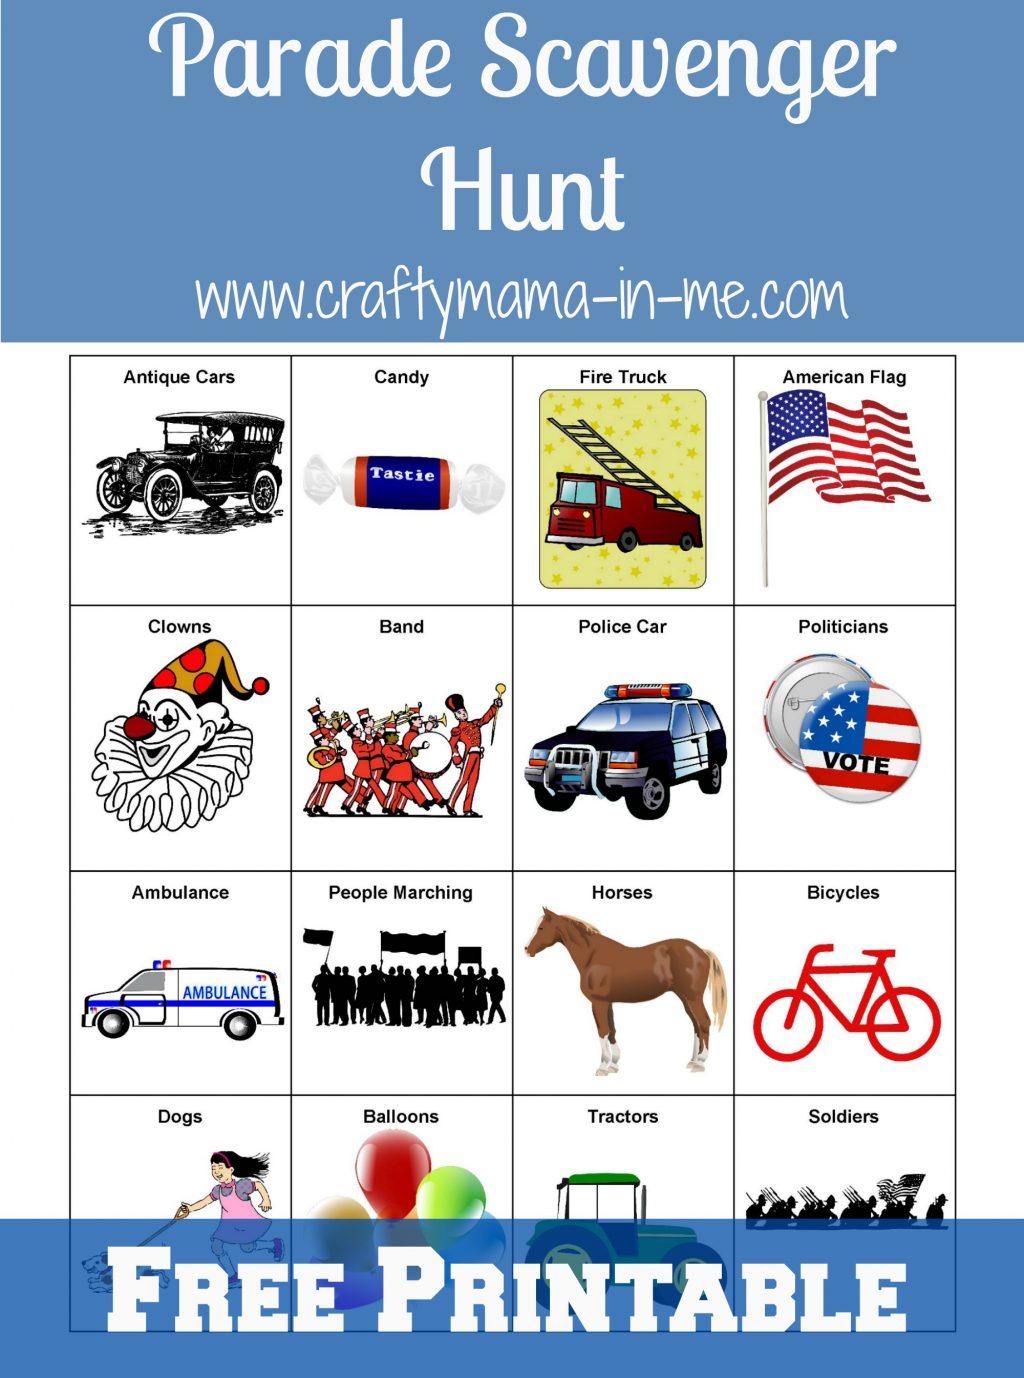 Parade Scavenger Hunt For Kids Free Printable